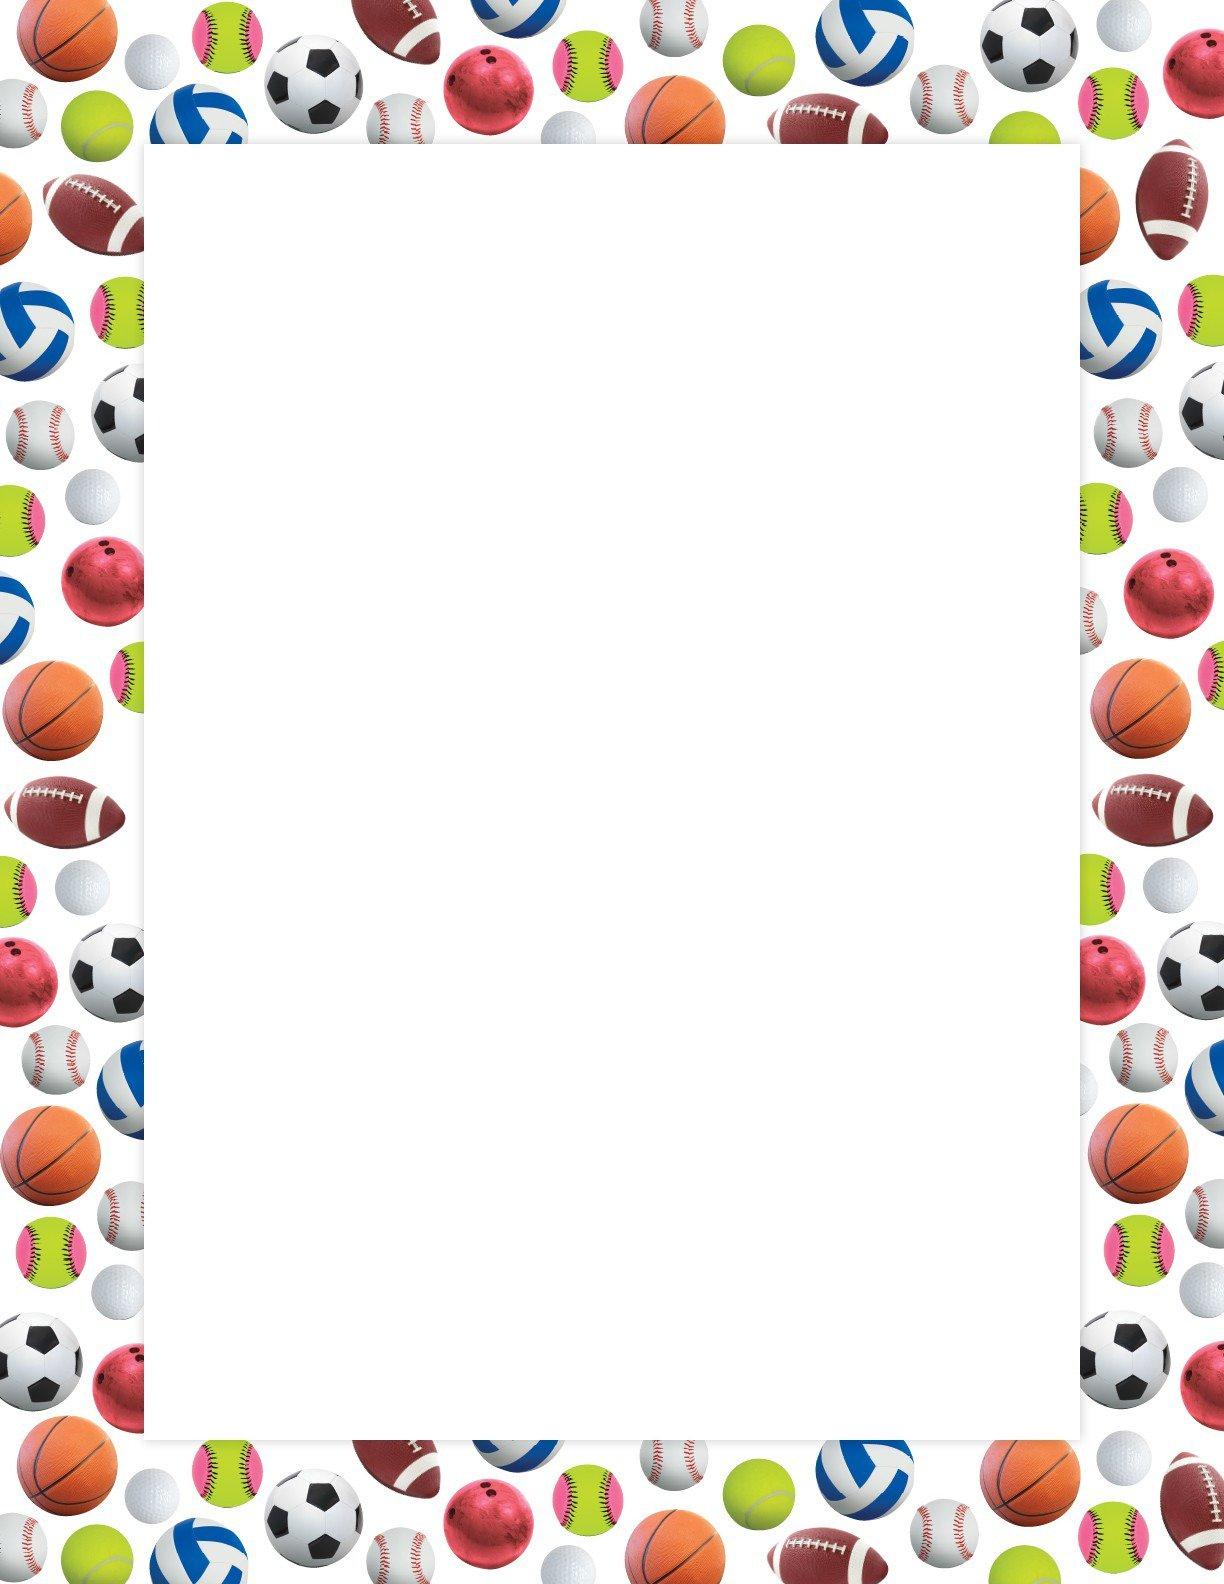 Sport Border Free Download Clip Art.